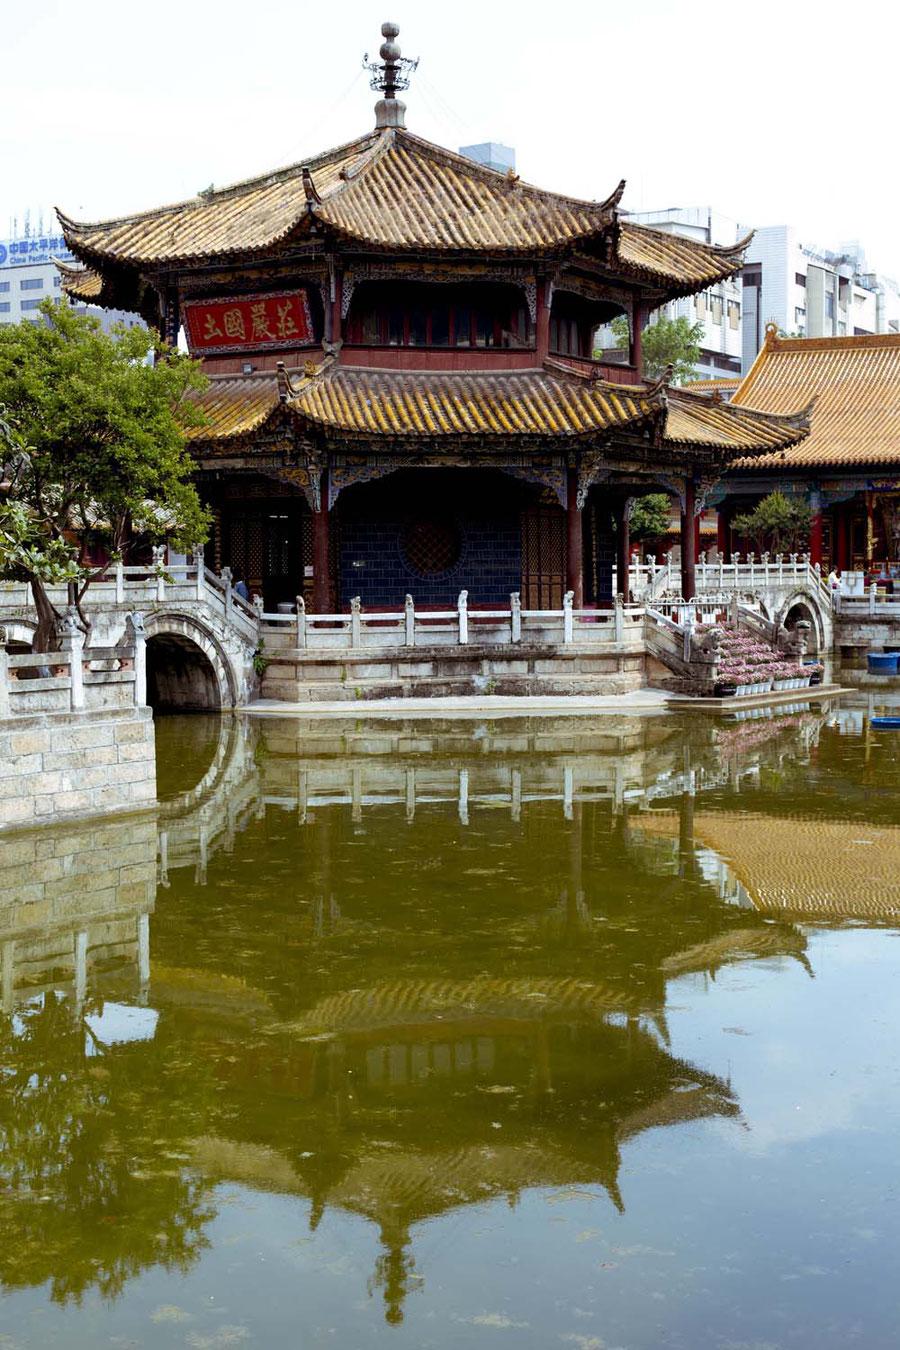 Der lange vernachlässigte Tempel, Kunming, China